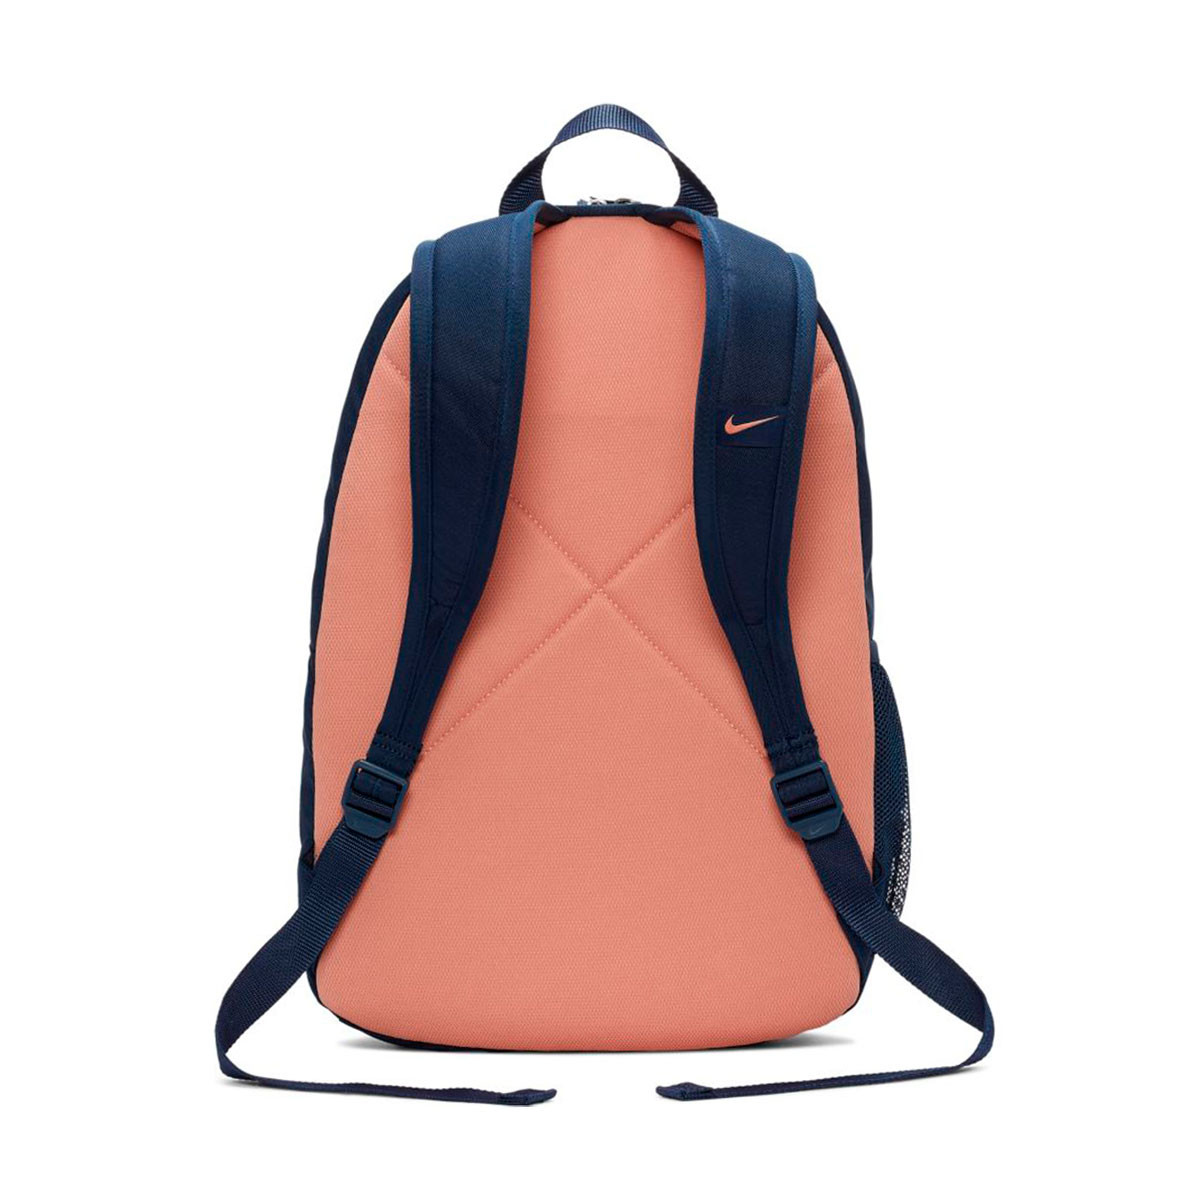 69ee99c2fc322 Backpack Nike Selección Francia Stadium 2018-2019 Midnight navy-Rose gold -  Football store Fútbol Emotion